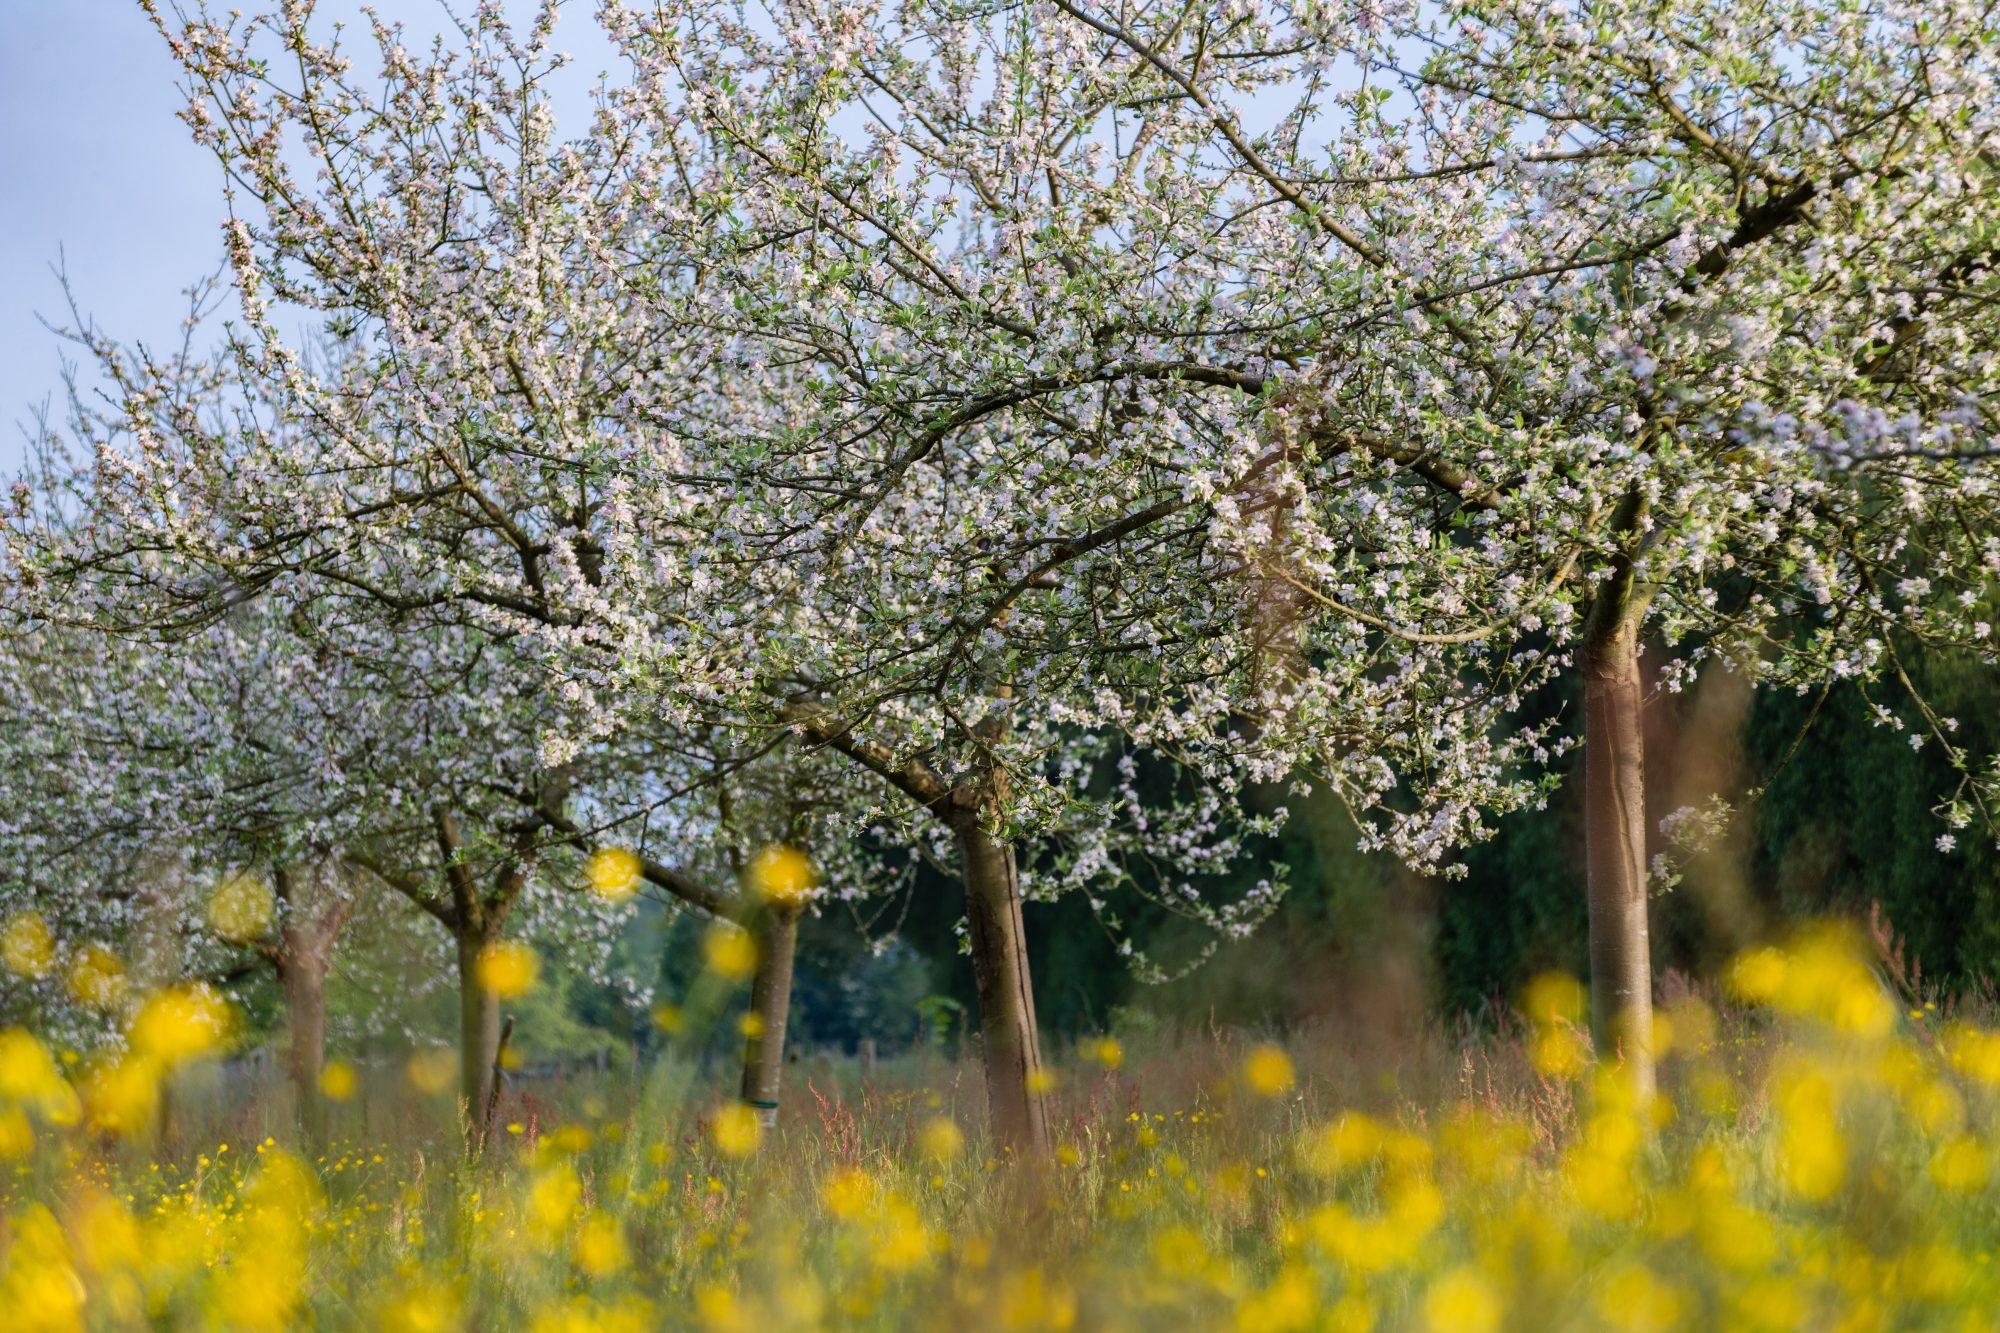 Pommiers en fleurs Isigny Omaha ©Th. Houyel Isigny Omaha Tourisme